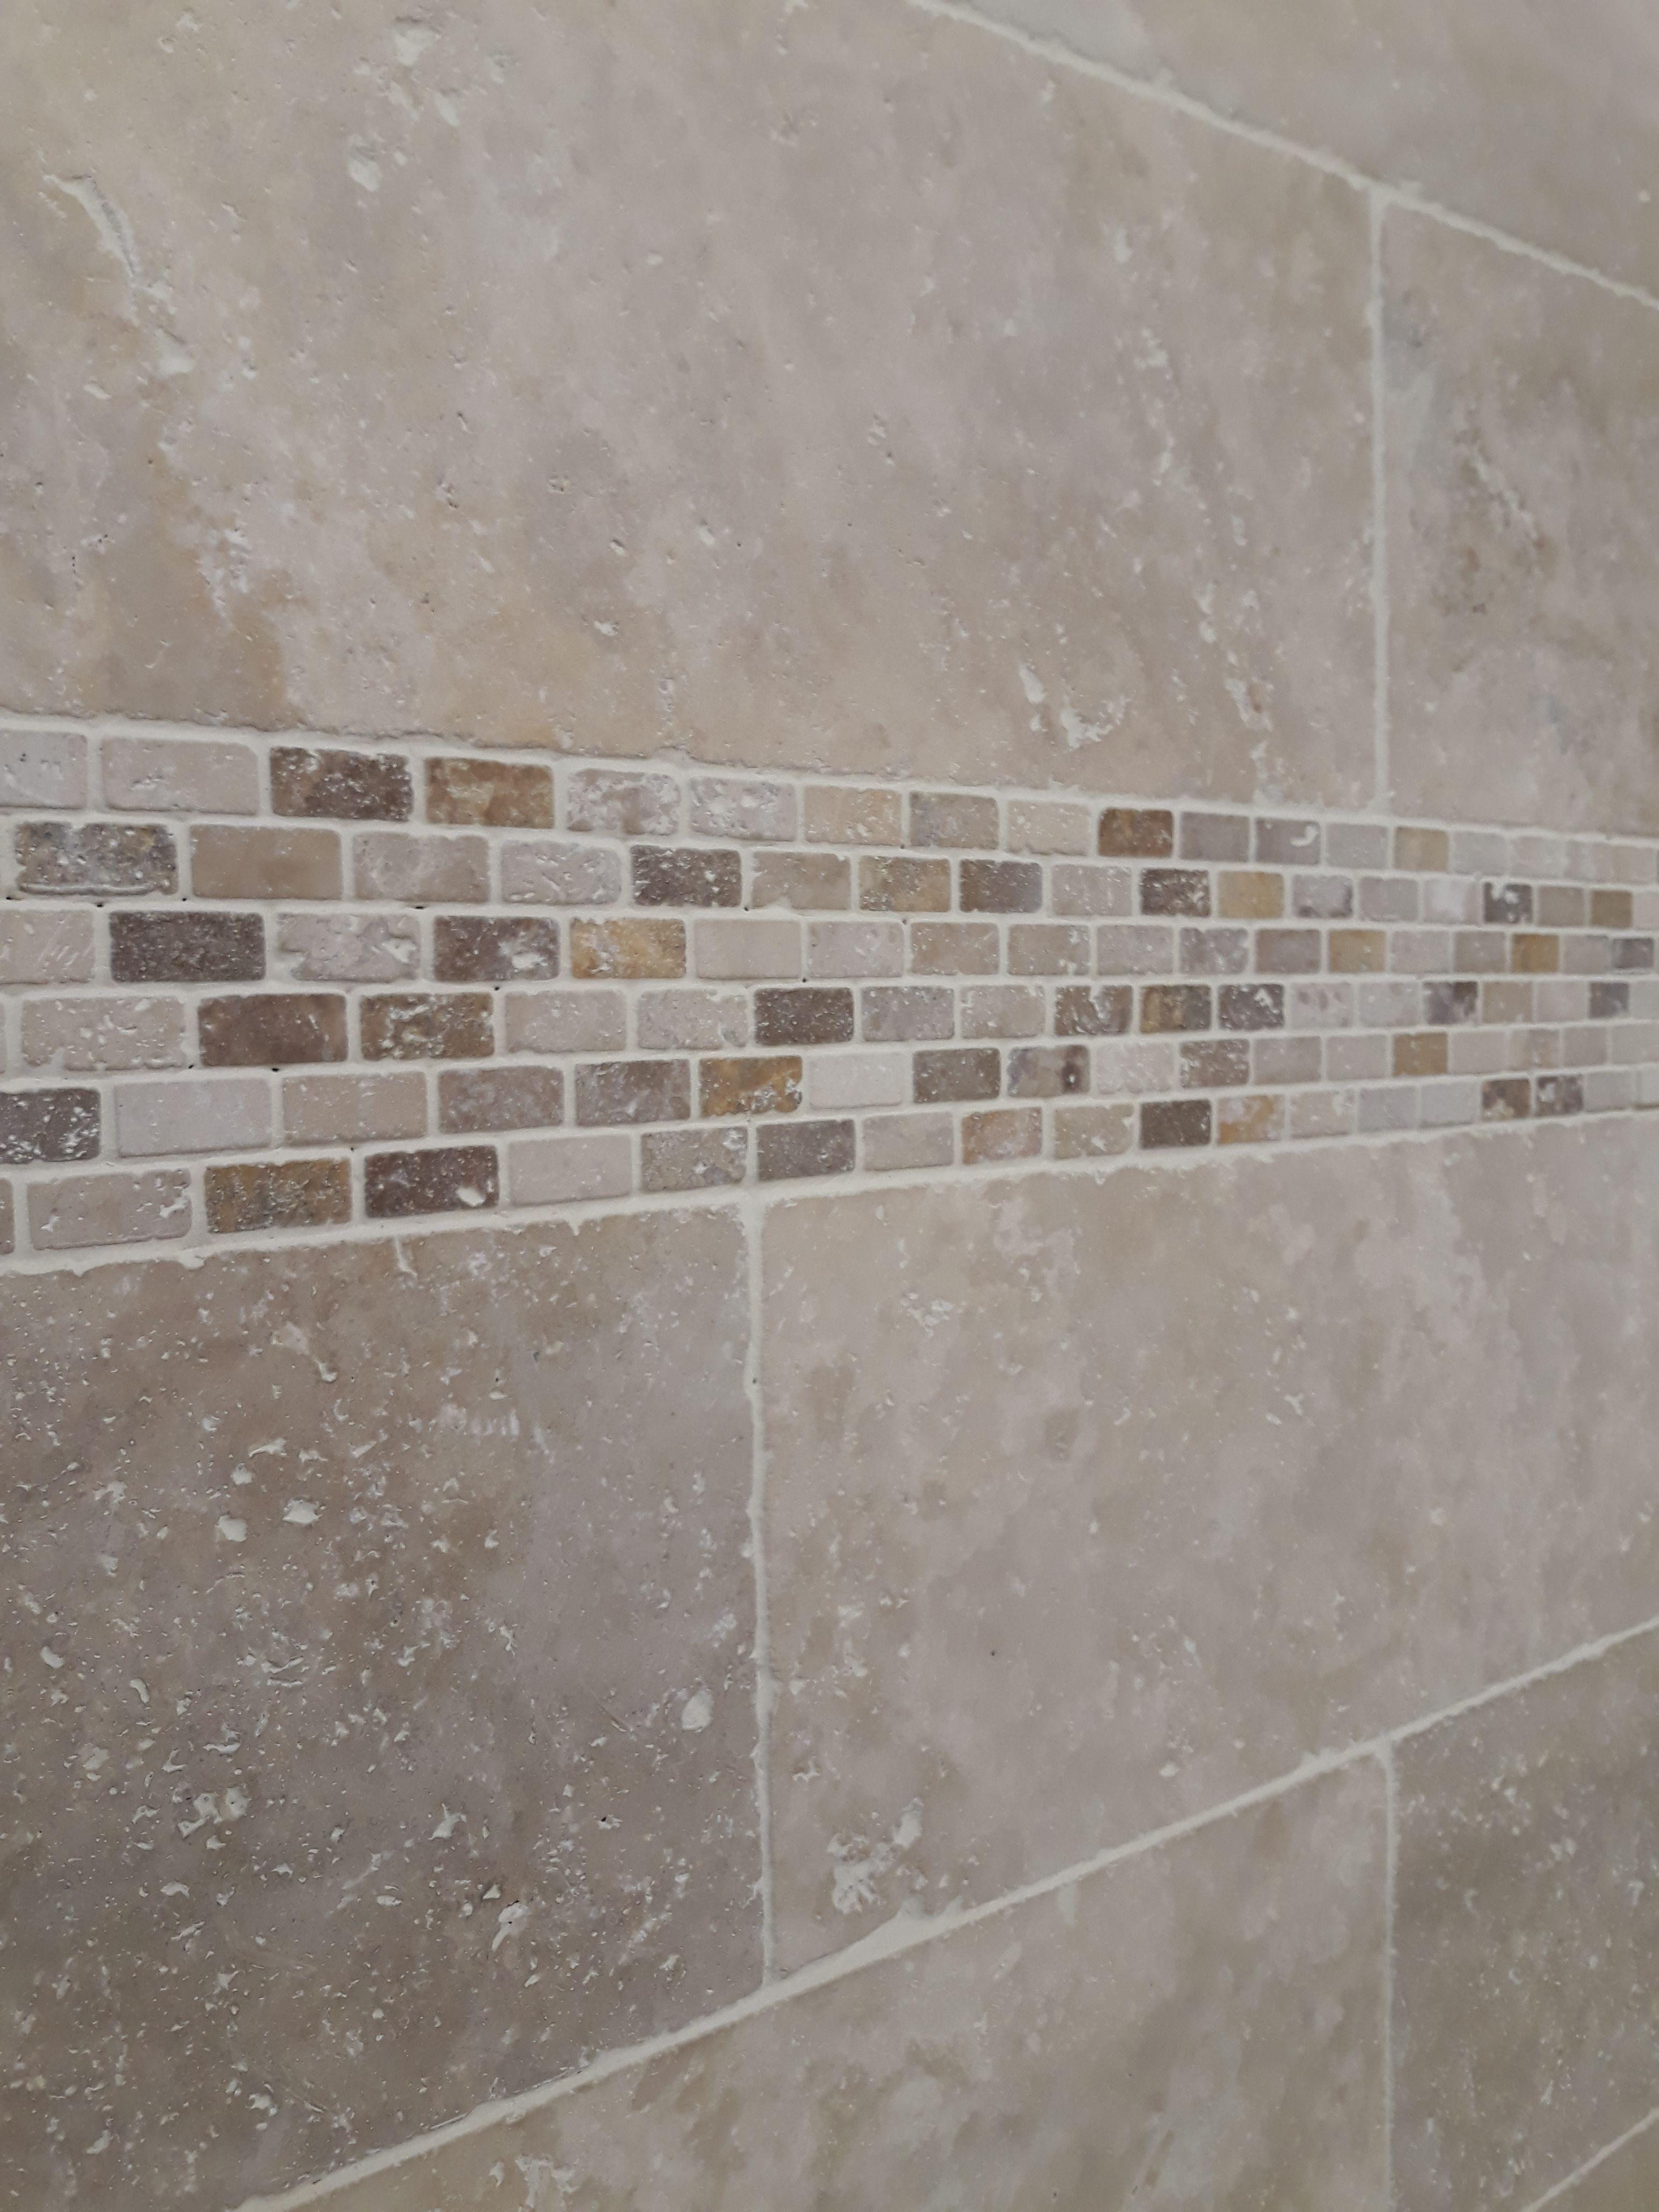 Exemple murs - Gamme Travertin - Leroy Merlin | CHOIX FINAUX ...